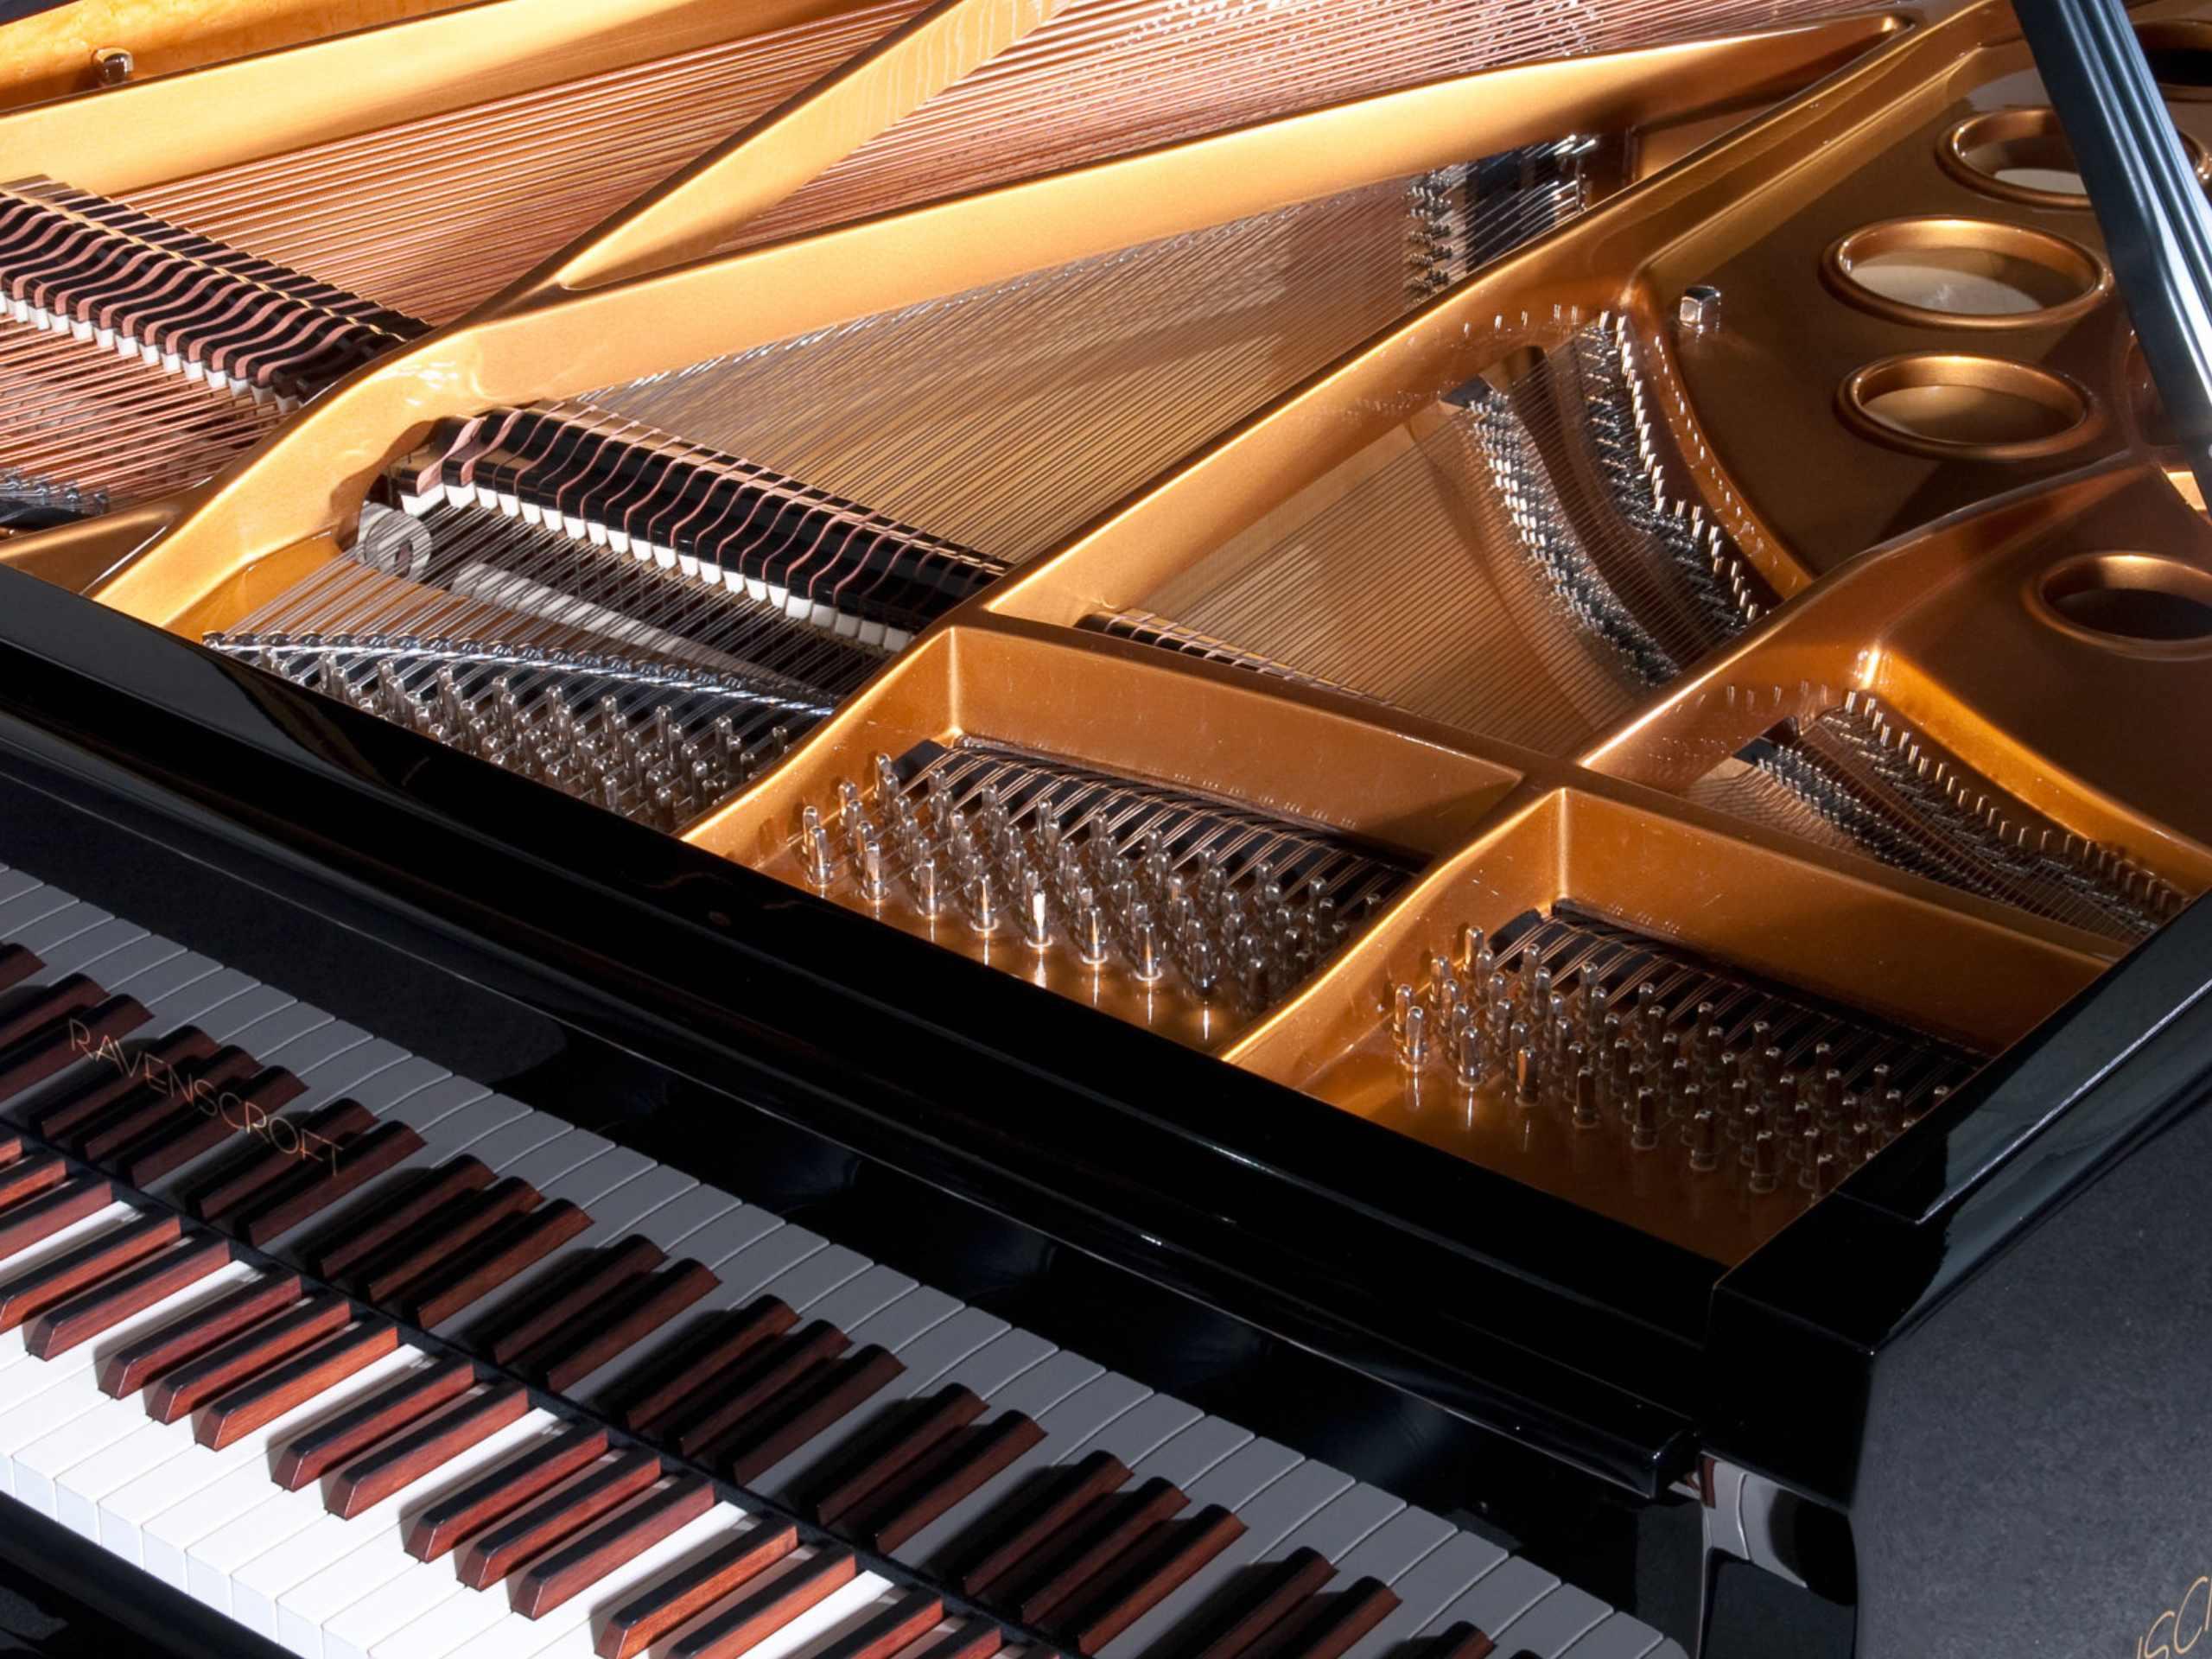 Ravenscroft Pianos